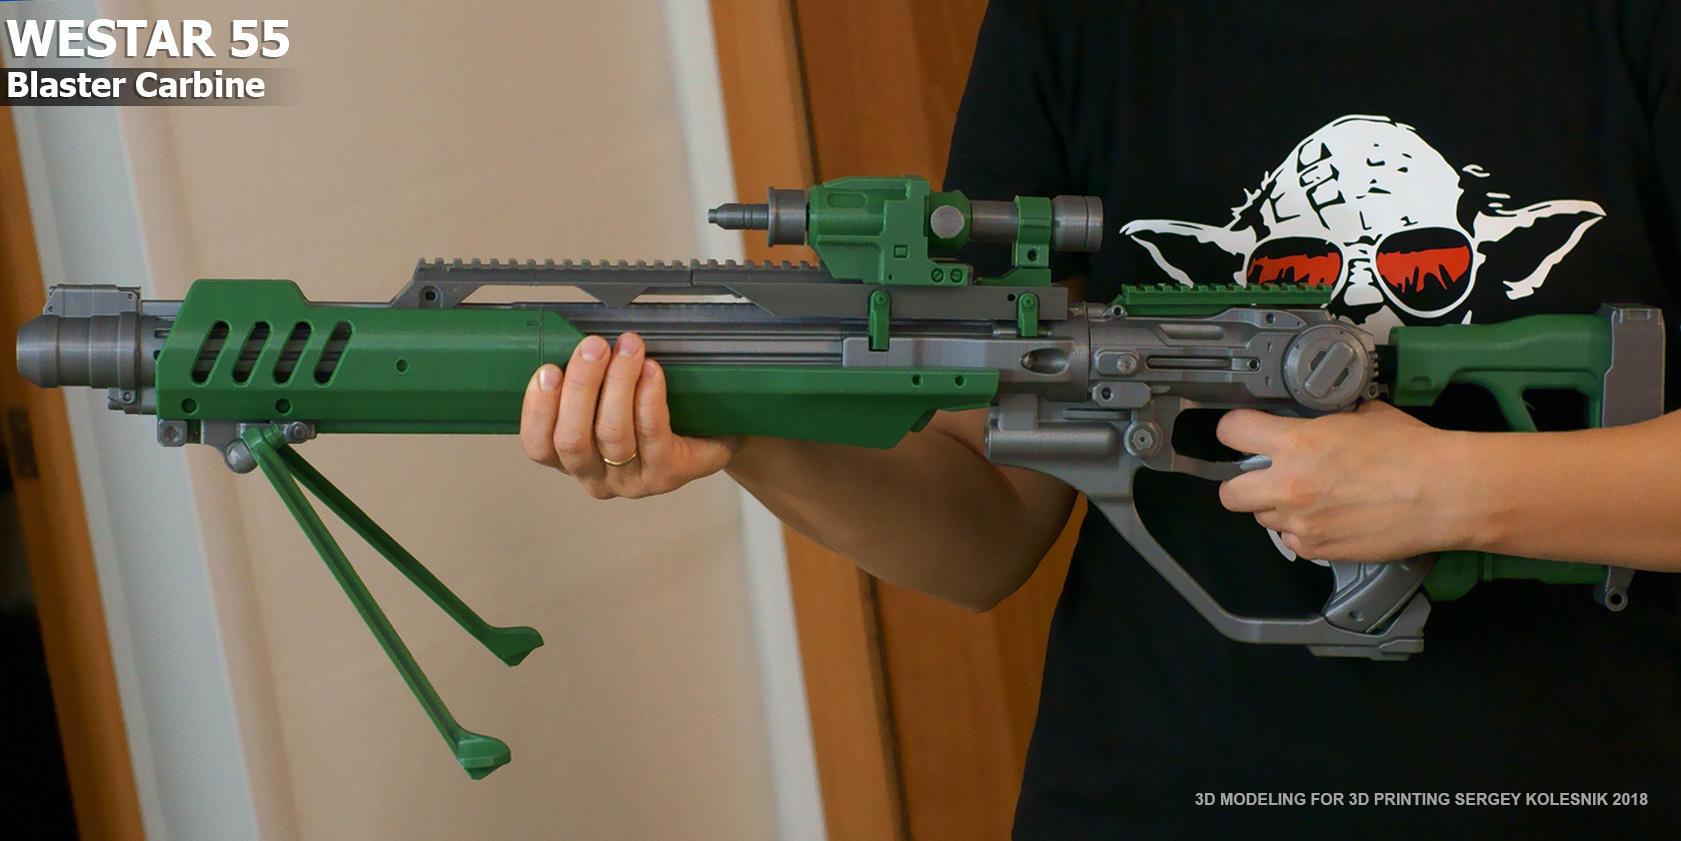 Westar-55 carabiner by ksn-art